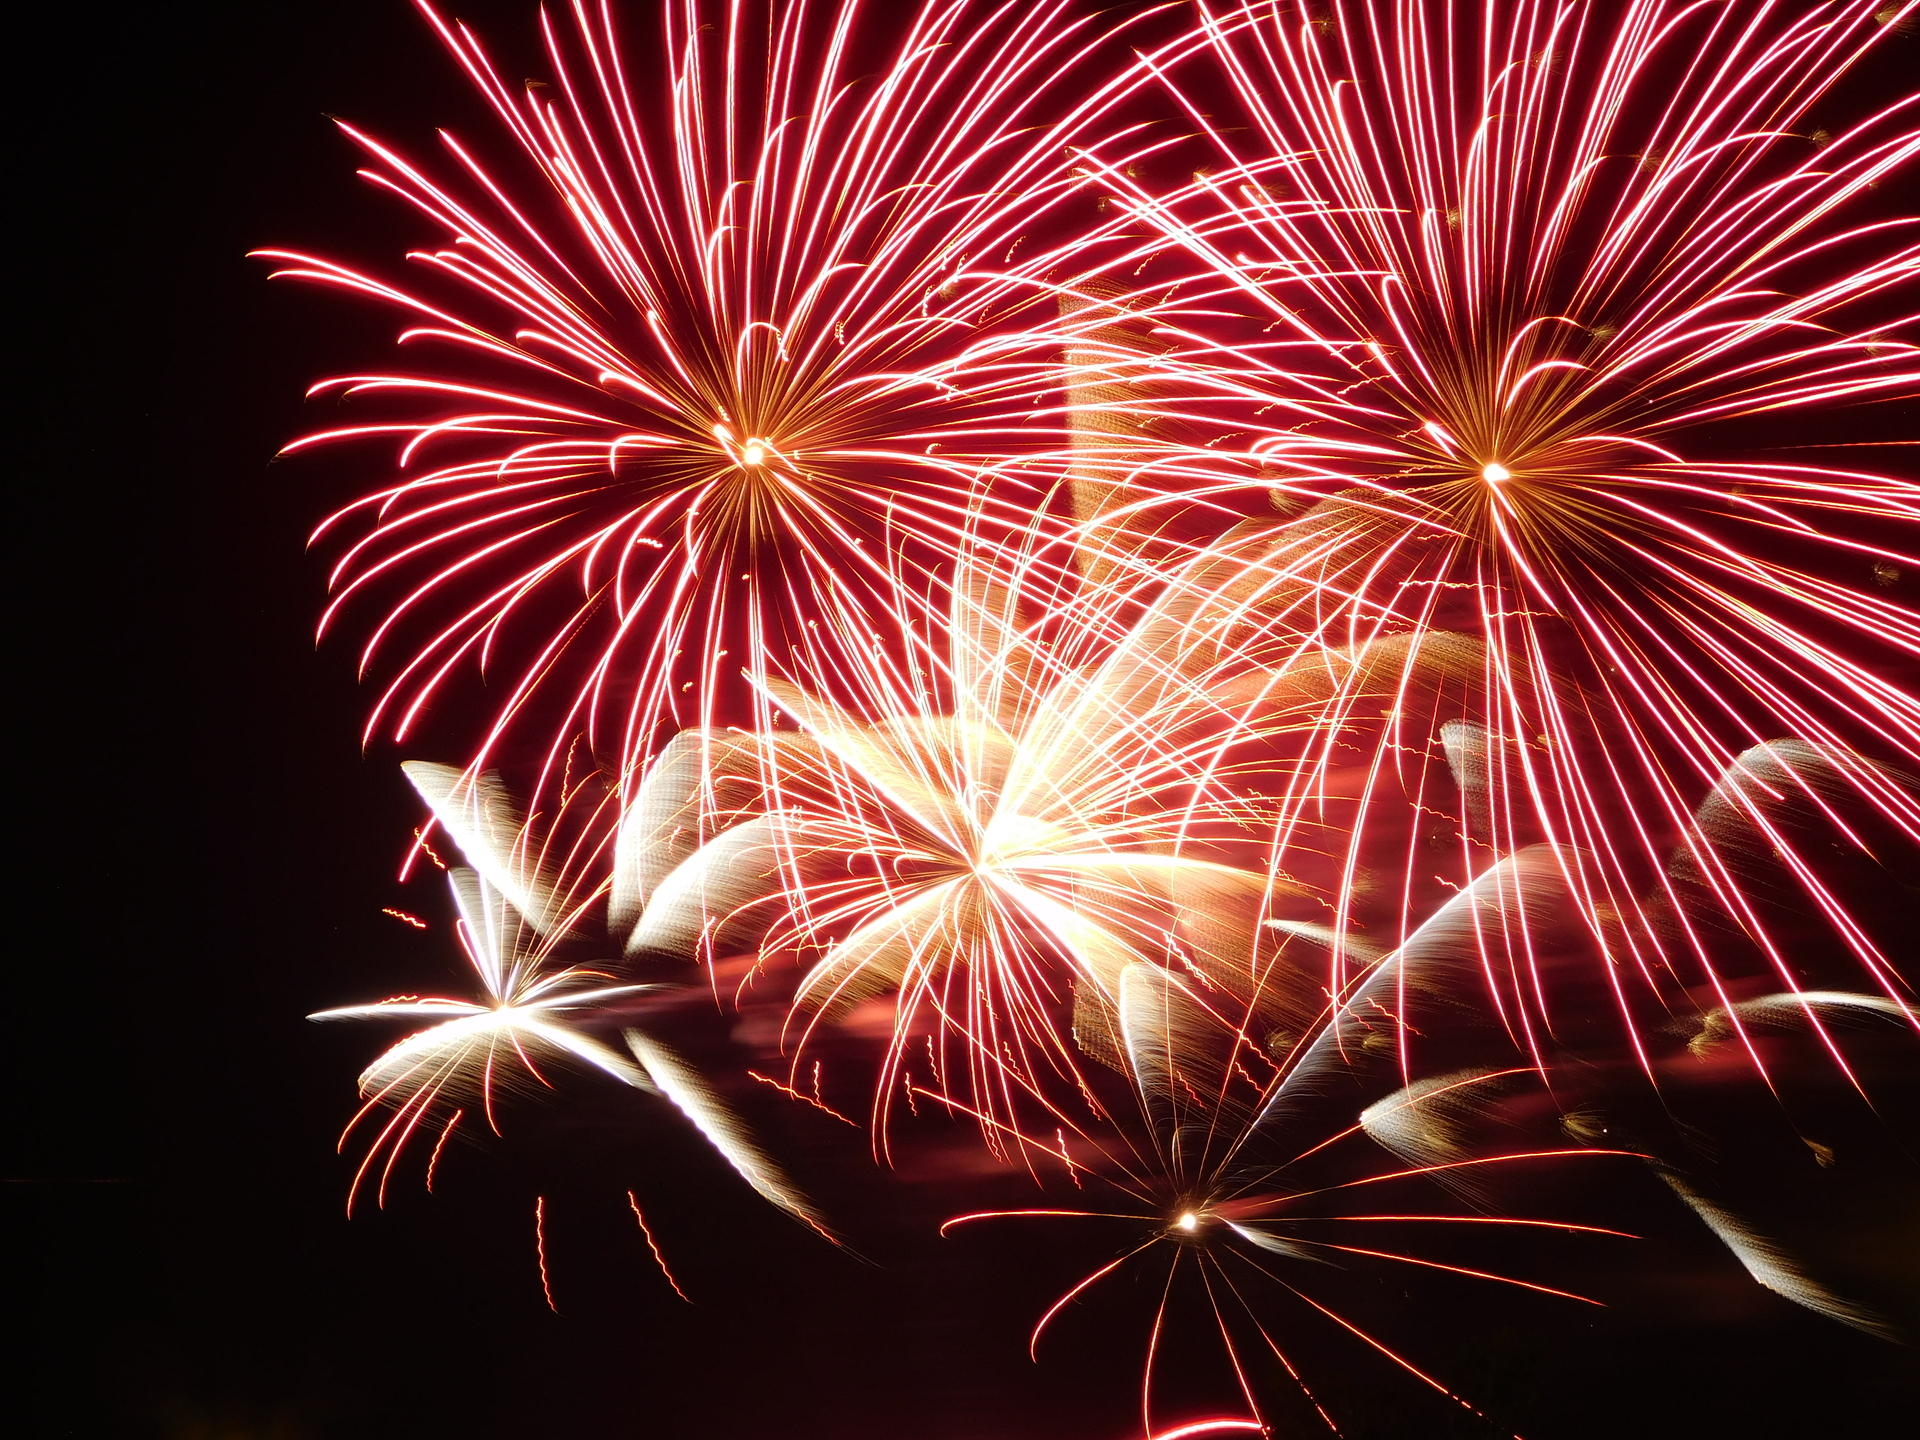 Fireworks   rick.cognyl.fournier, bright, celebration, color